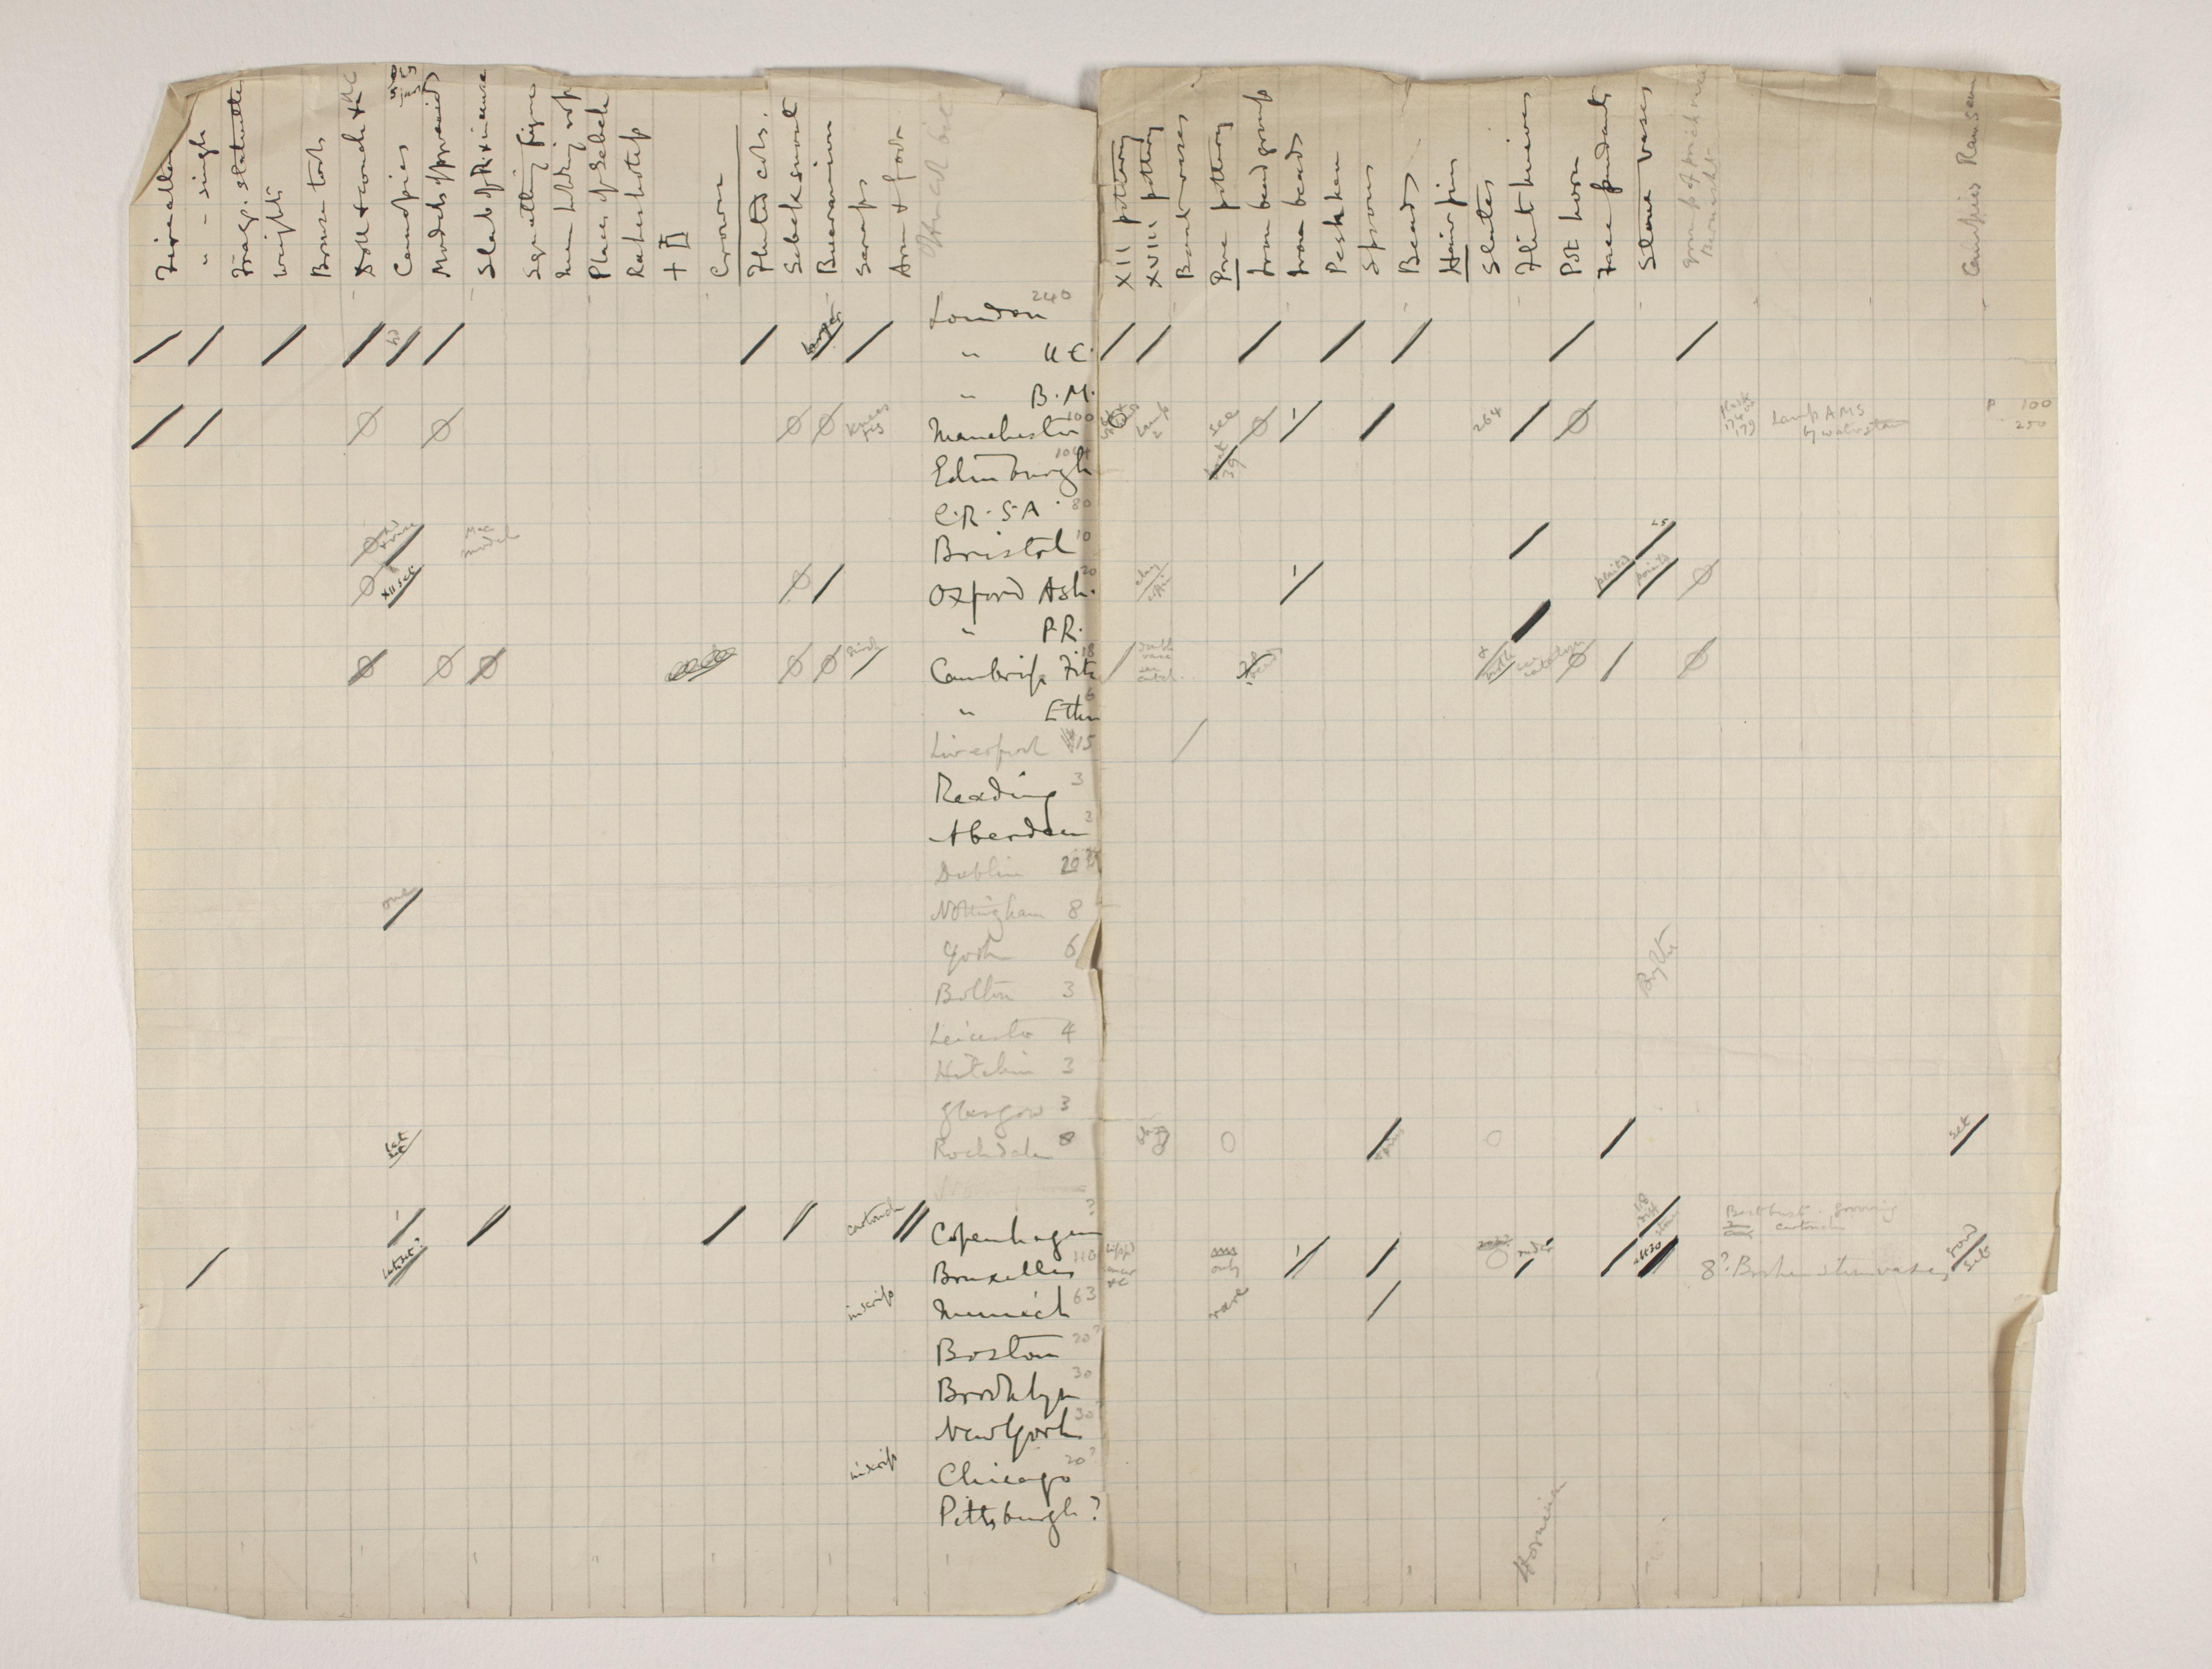 1910-11 Hawara, Gerzeh, Memphis, Mazghuneh Distribution grid PMA/WFP1/D/19/1.1